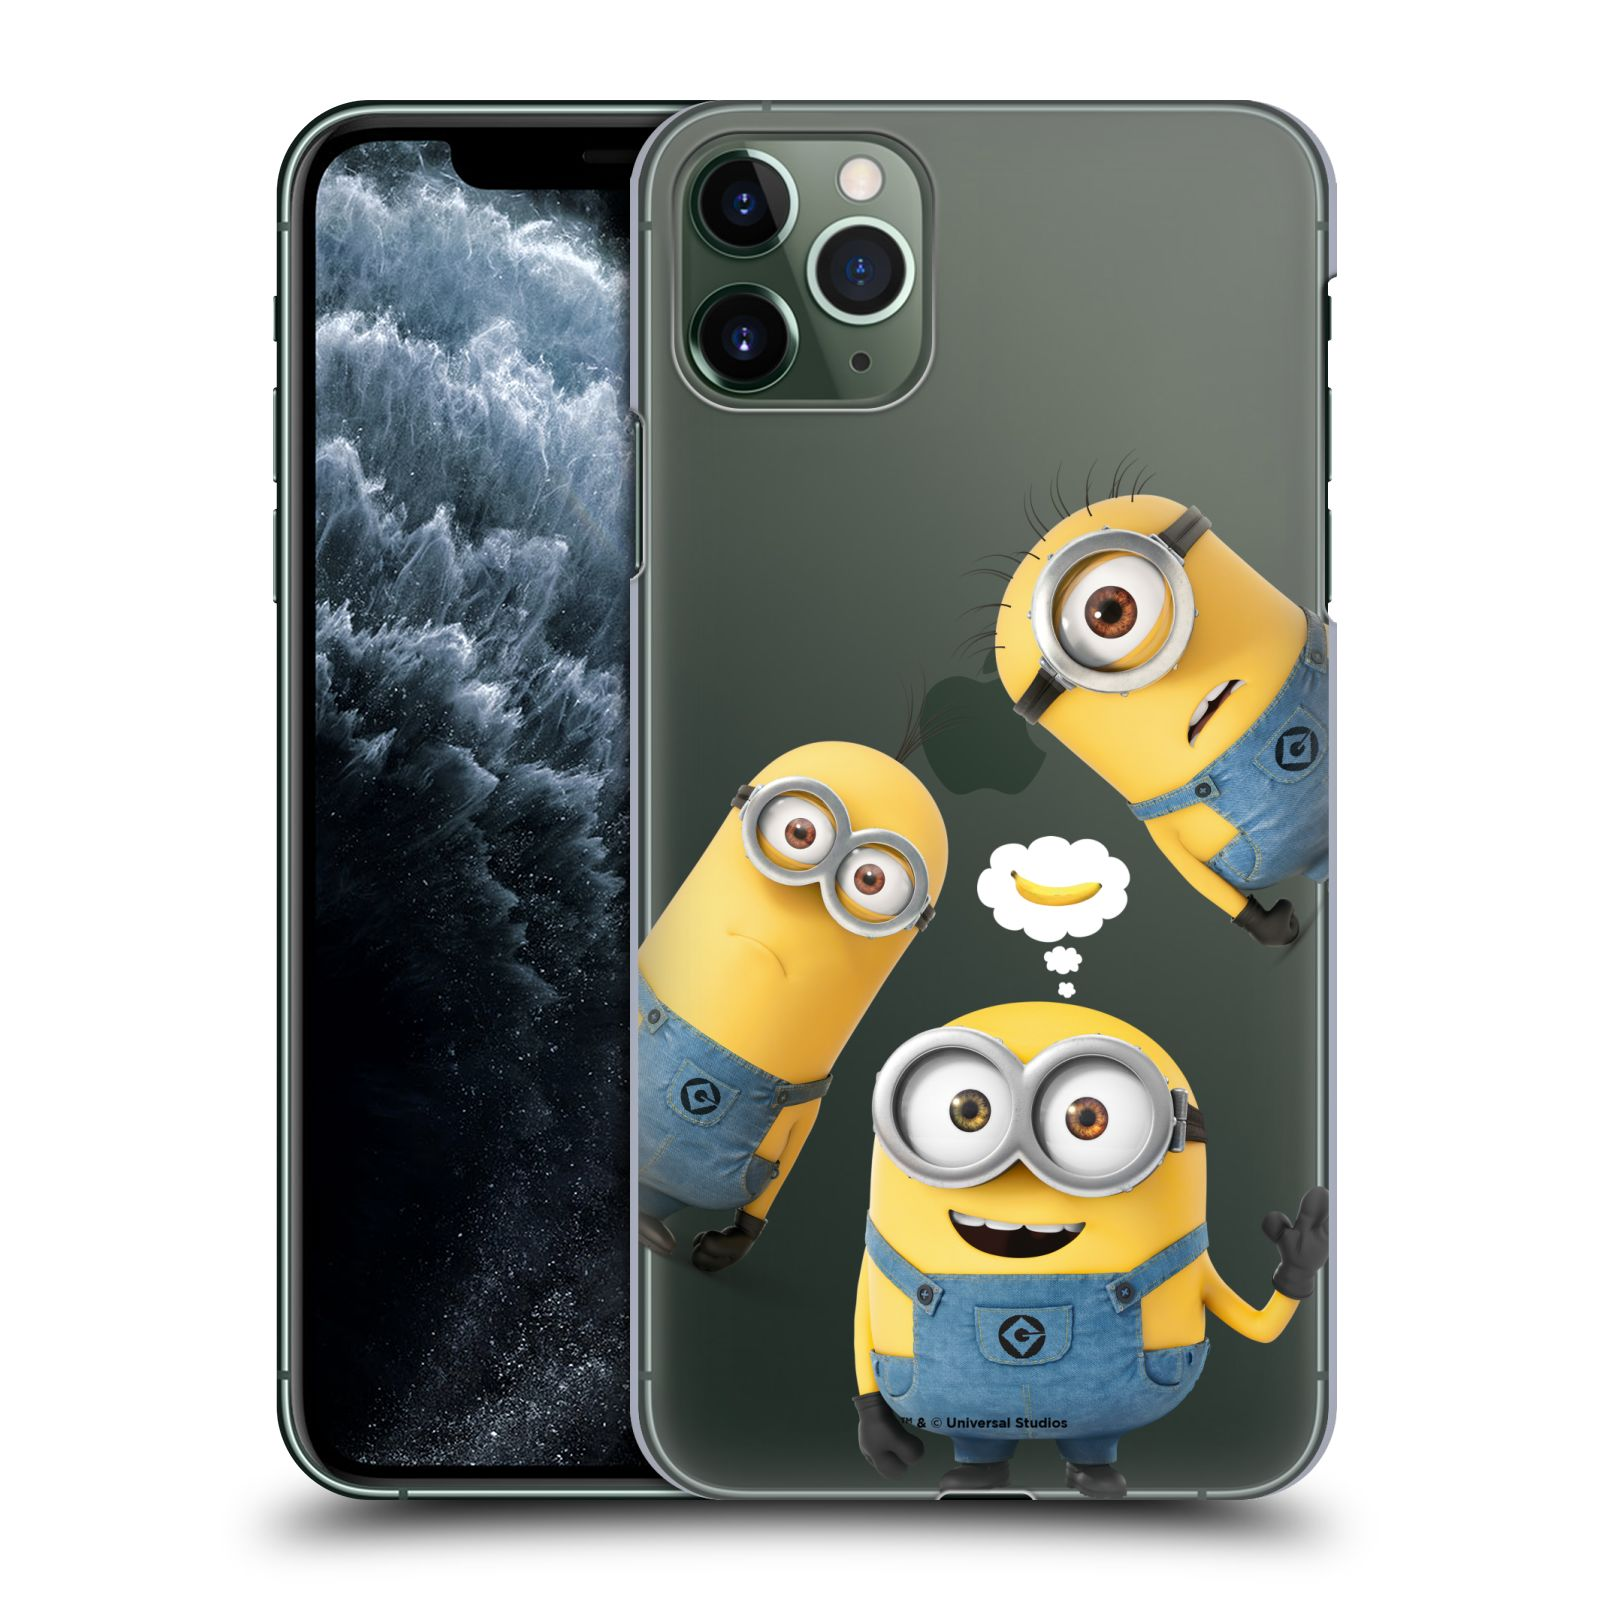 Plastové pouzdro na mobil Apple iPhone 11 Pro Max - Head Case - Mimoni Banana z filmu Já, padouch - Despicable Me